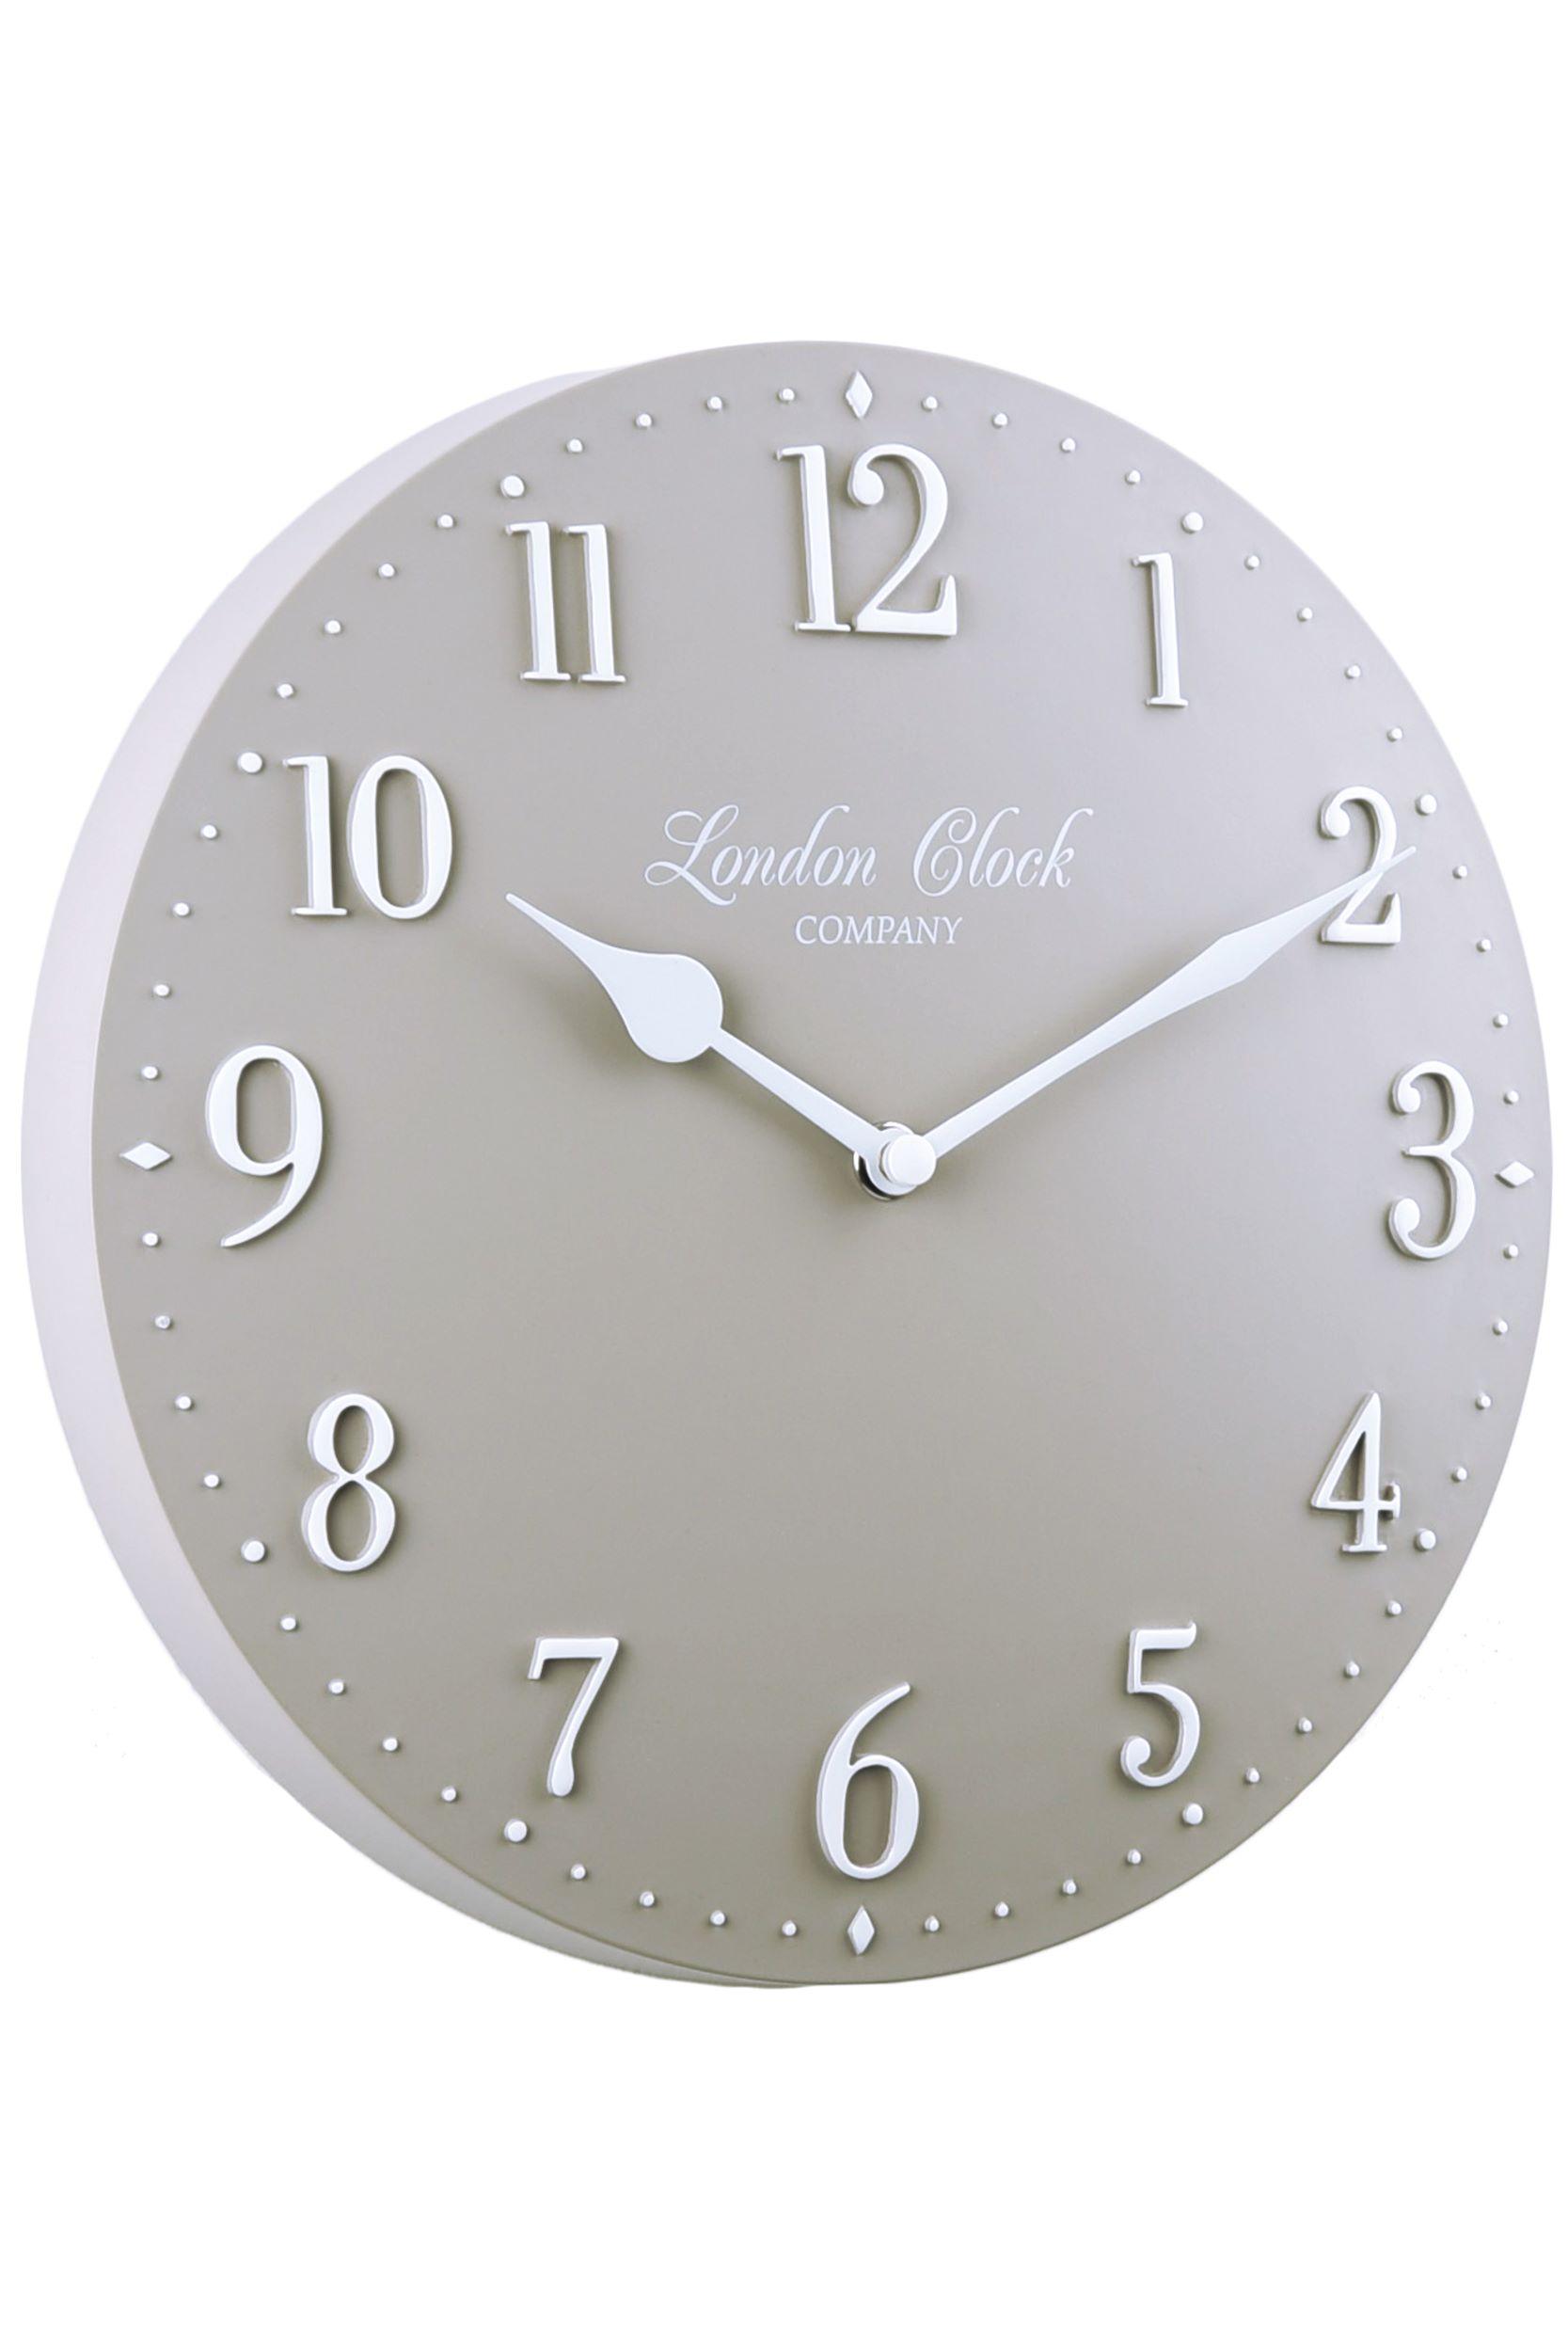 London reloj wanduhr 25cm 01108 reloj de pared con pilas - Mecanismo reloj pared ...